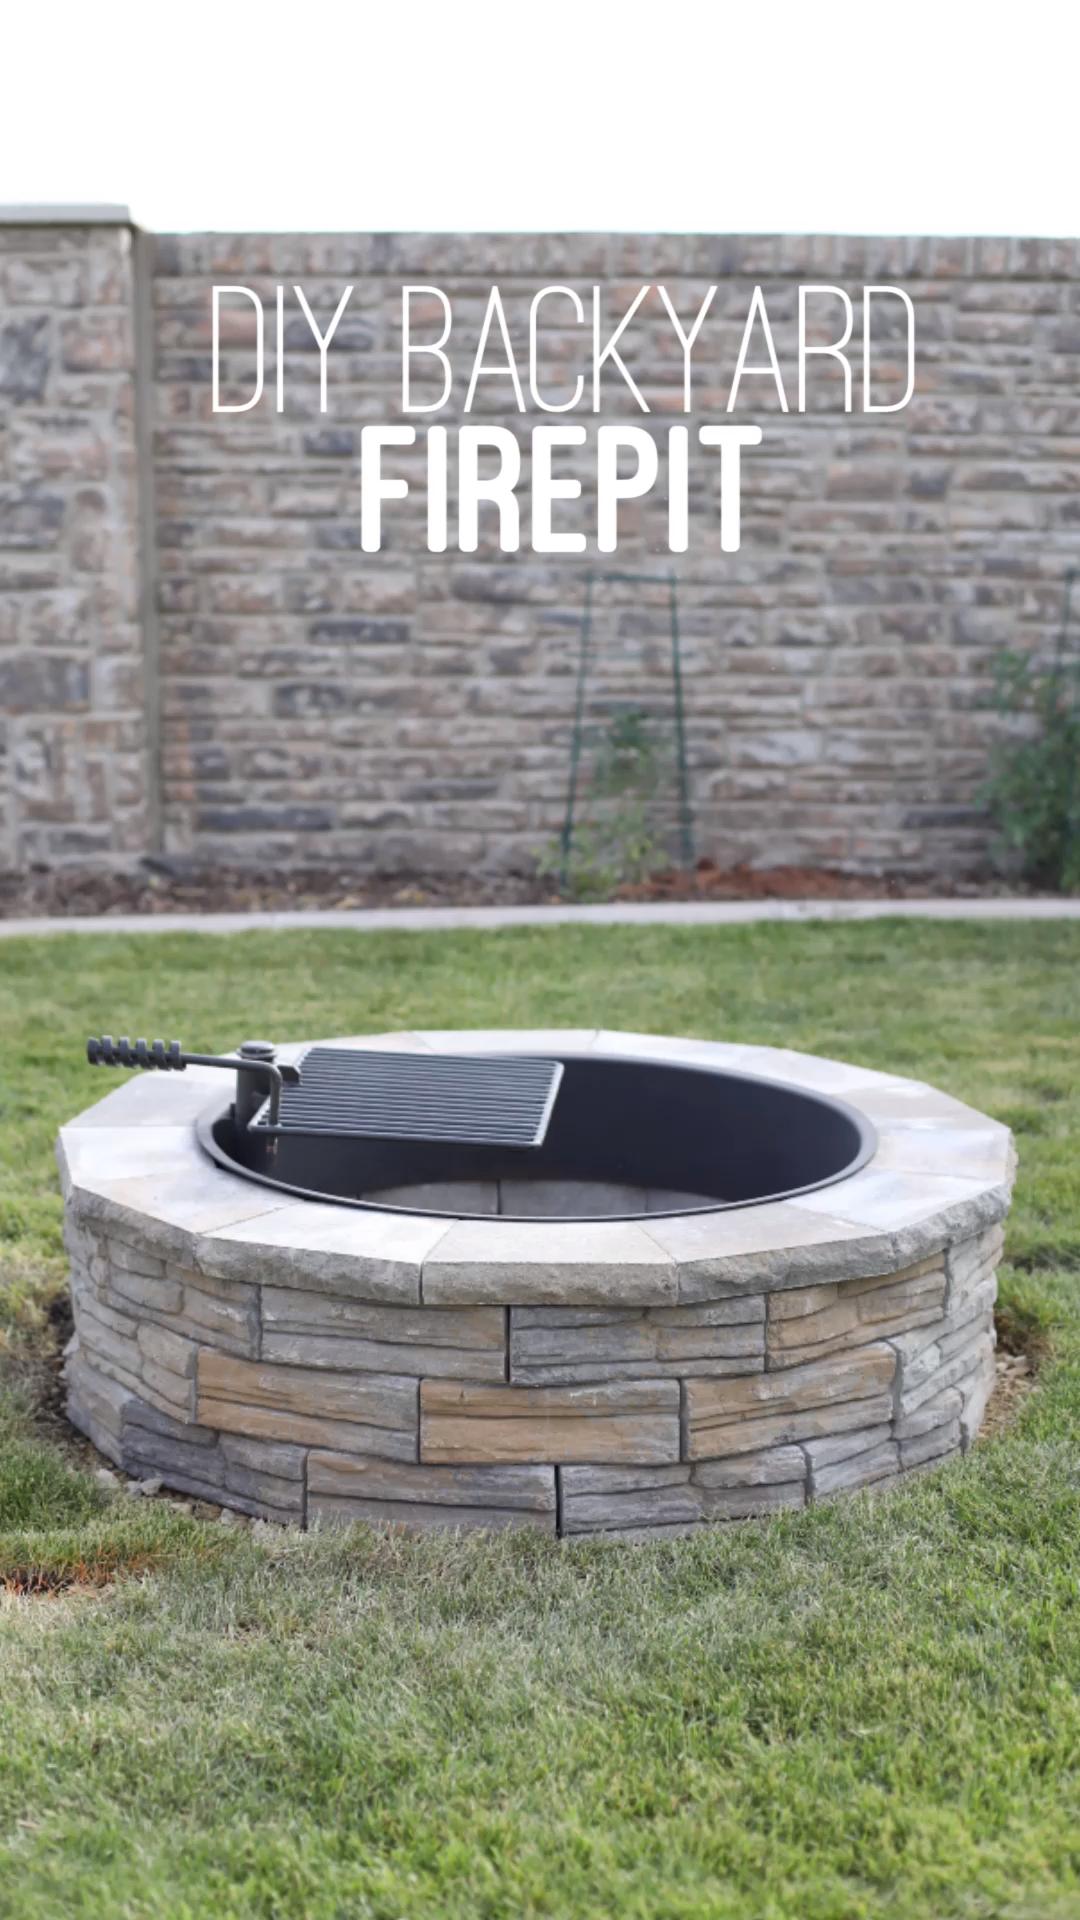 DIY backyard firepit. Summer night marshmallow roasts got an upgrade at our house. DIY backyard firepit tutorial using wall blocks. I had a 36